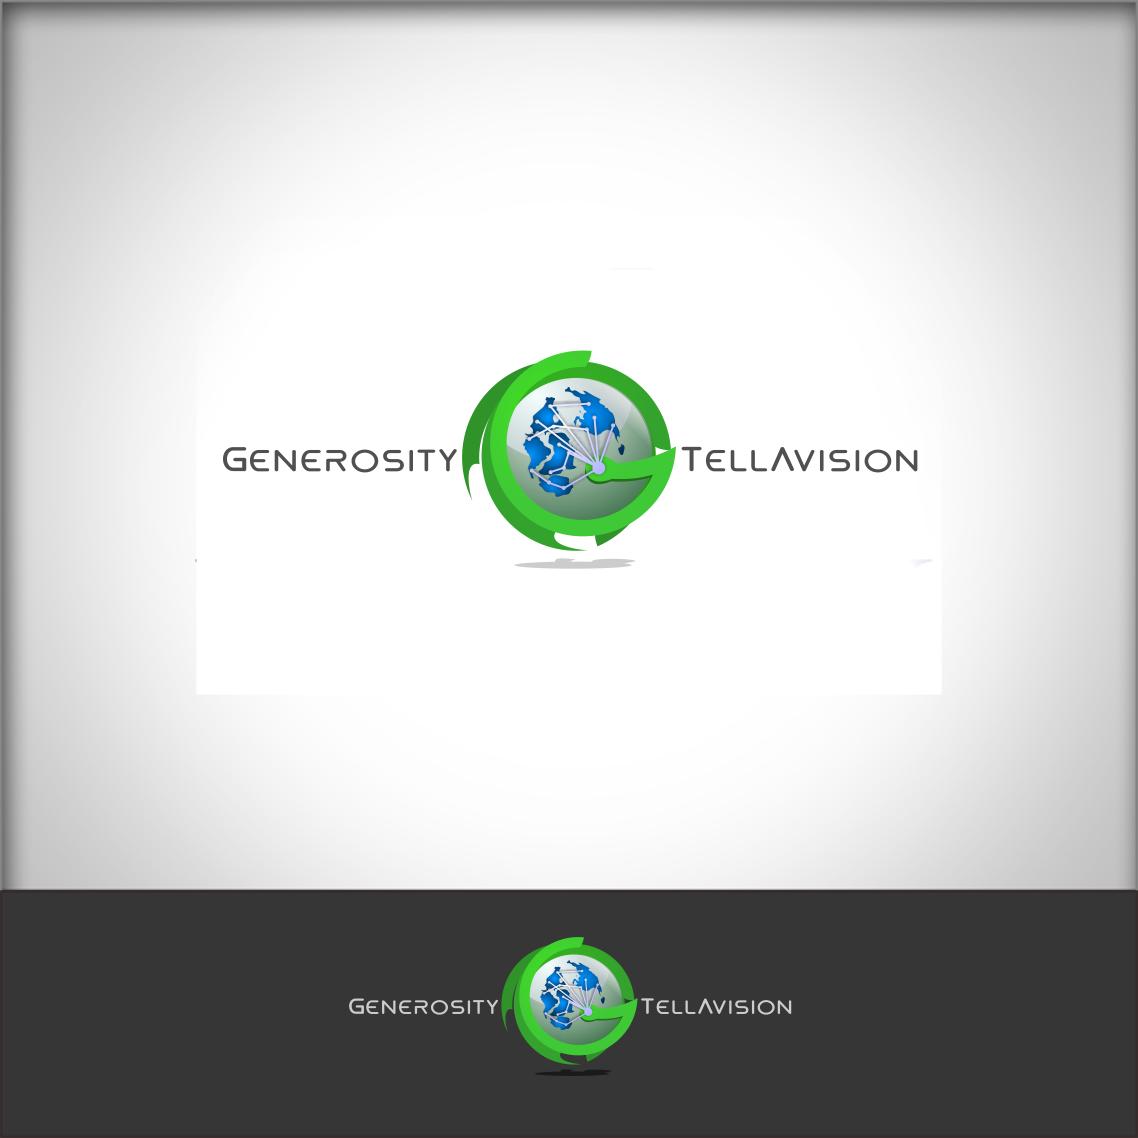 Logo Design by Private User - Entry No. 114 in the Logo Design Contest Artistic Logo Design for Generosity TellAVision.